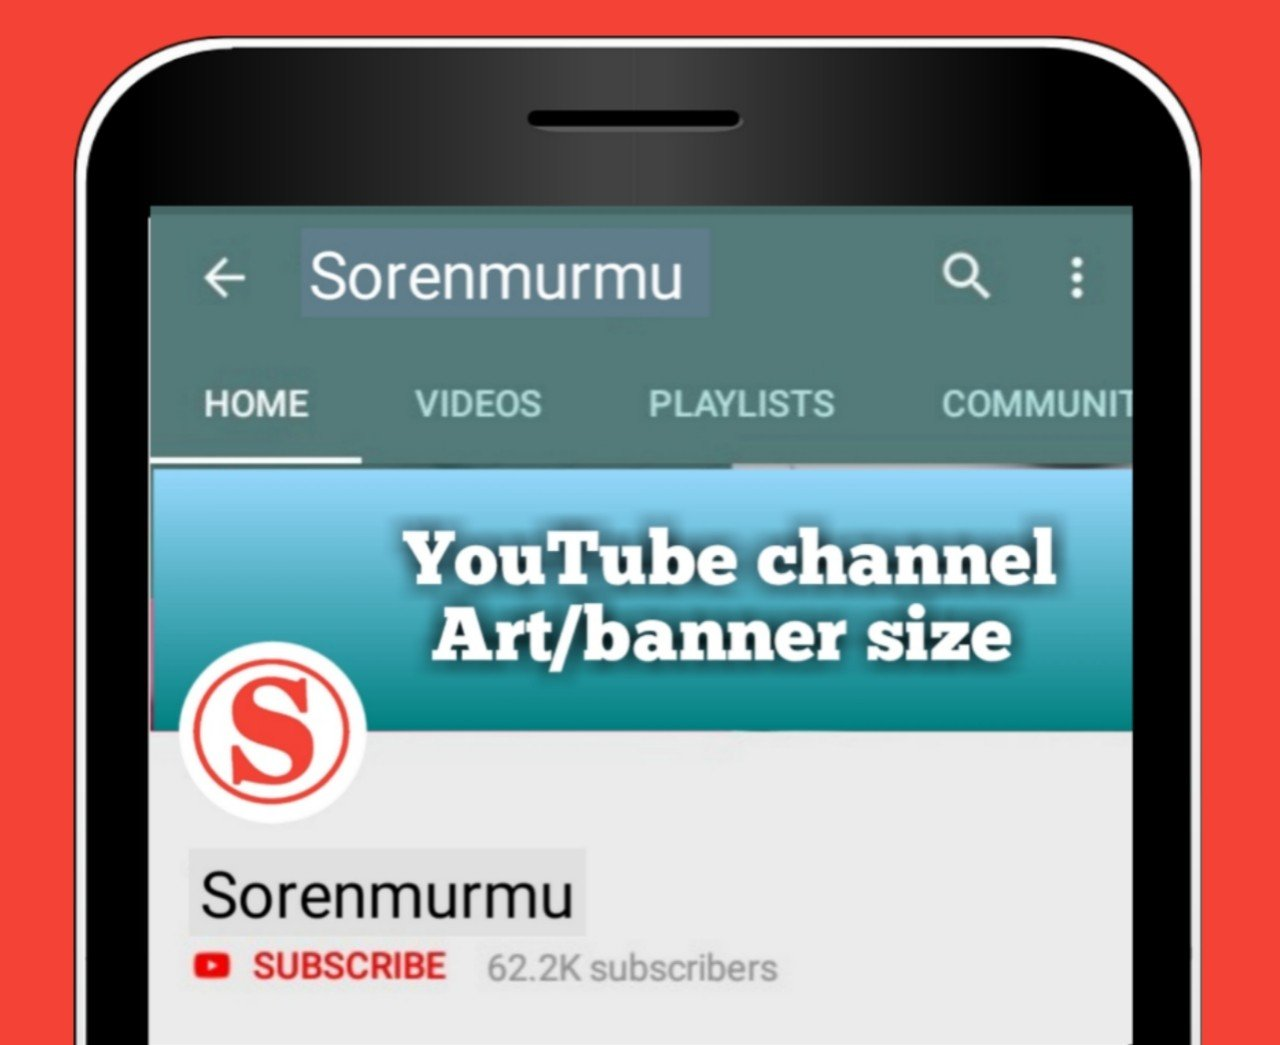 2,048 x 1,152 pixels · maximum banner width: Youtube Channel Art Size Youtube Channel Banner Size Sorenmurmu